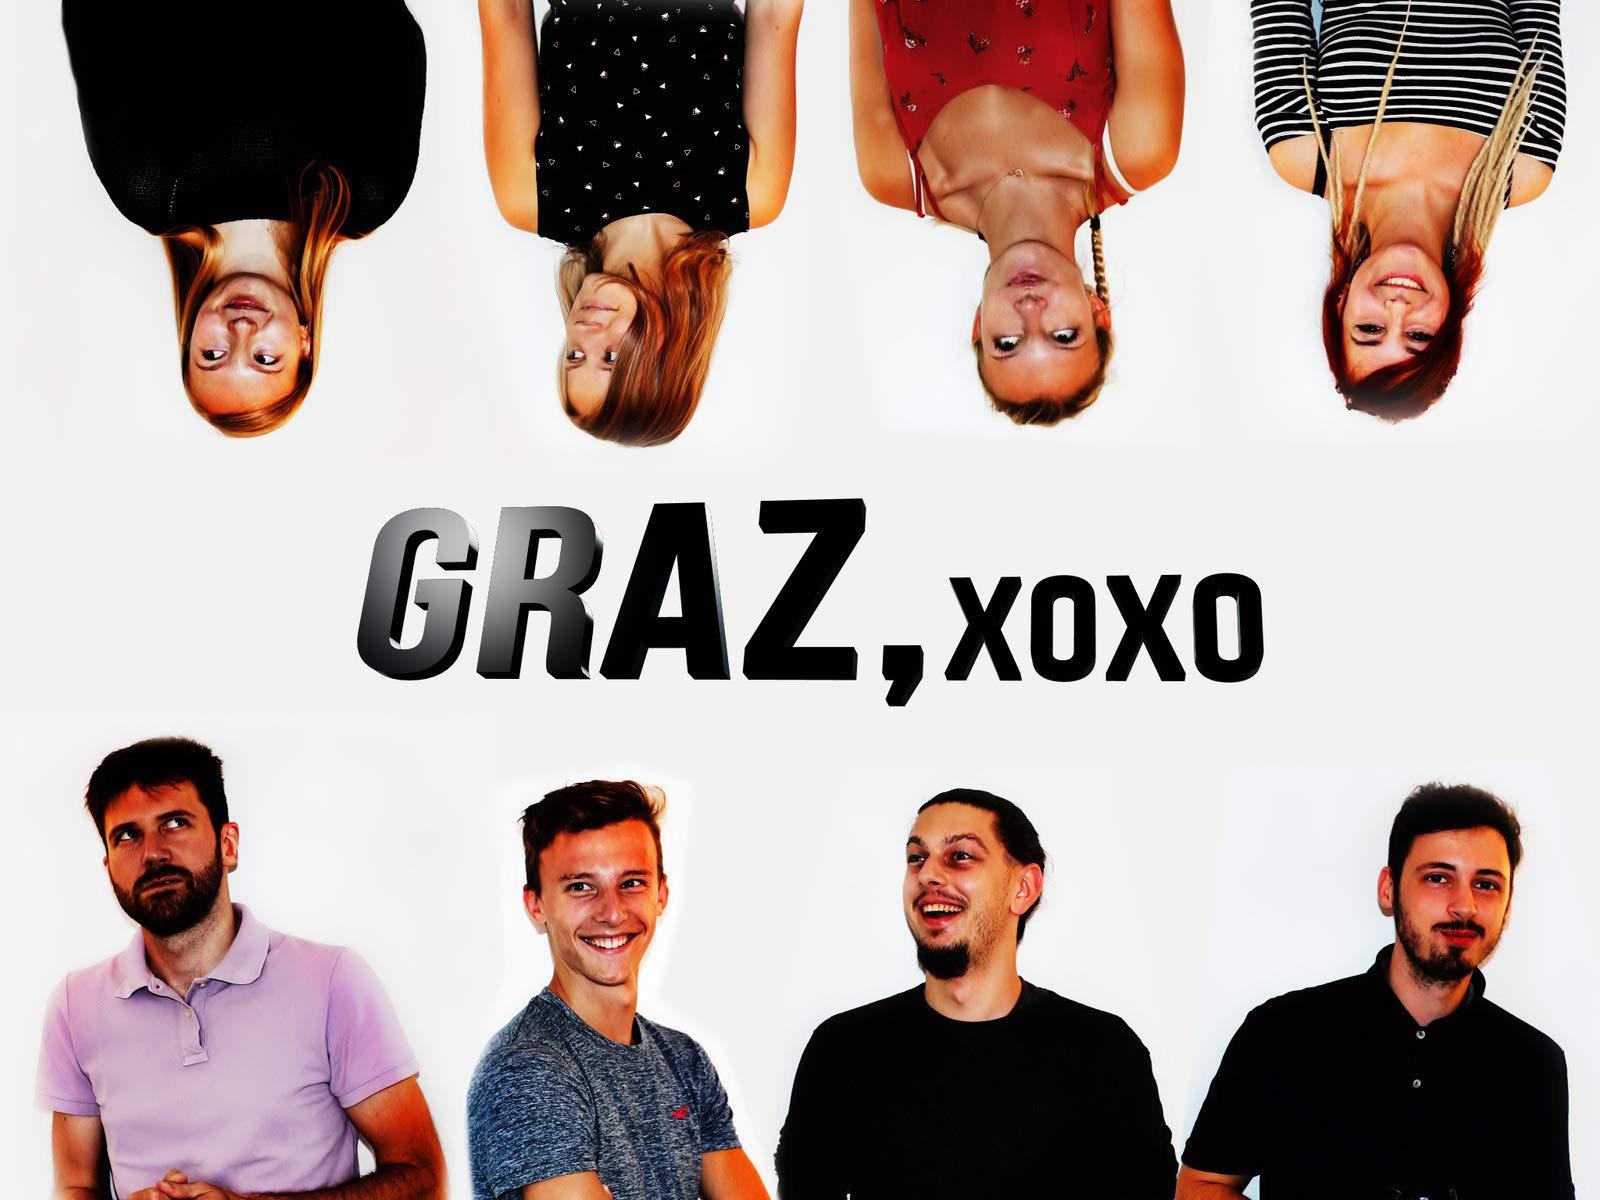 Graz, XOXO - Season 1